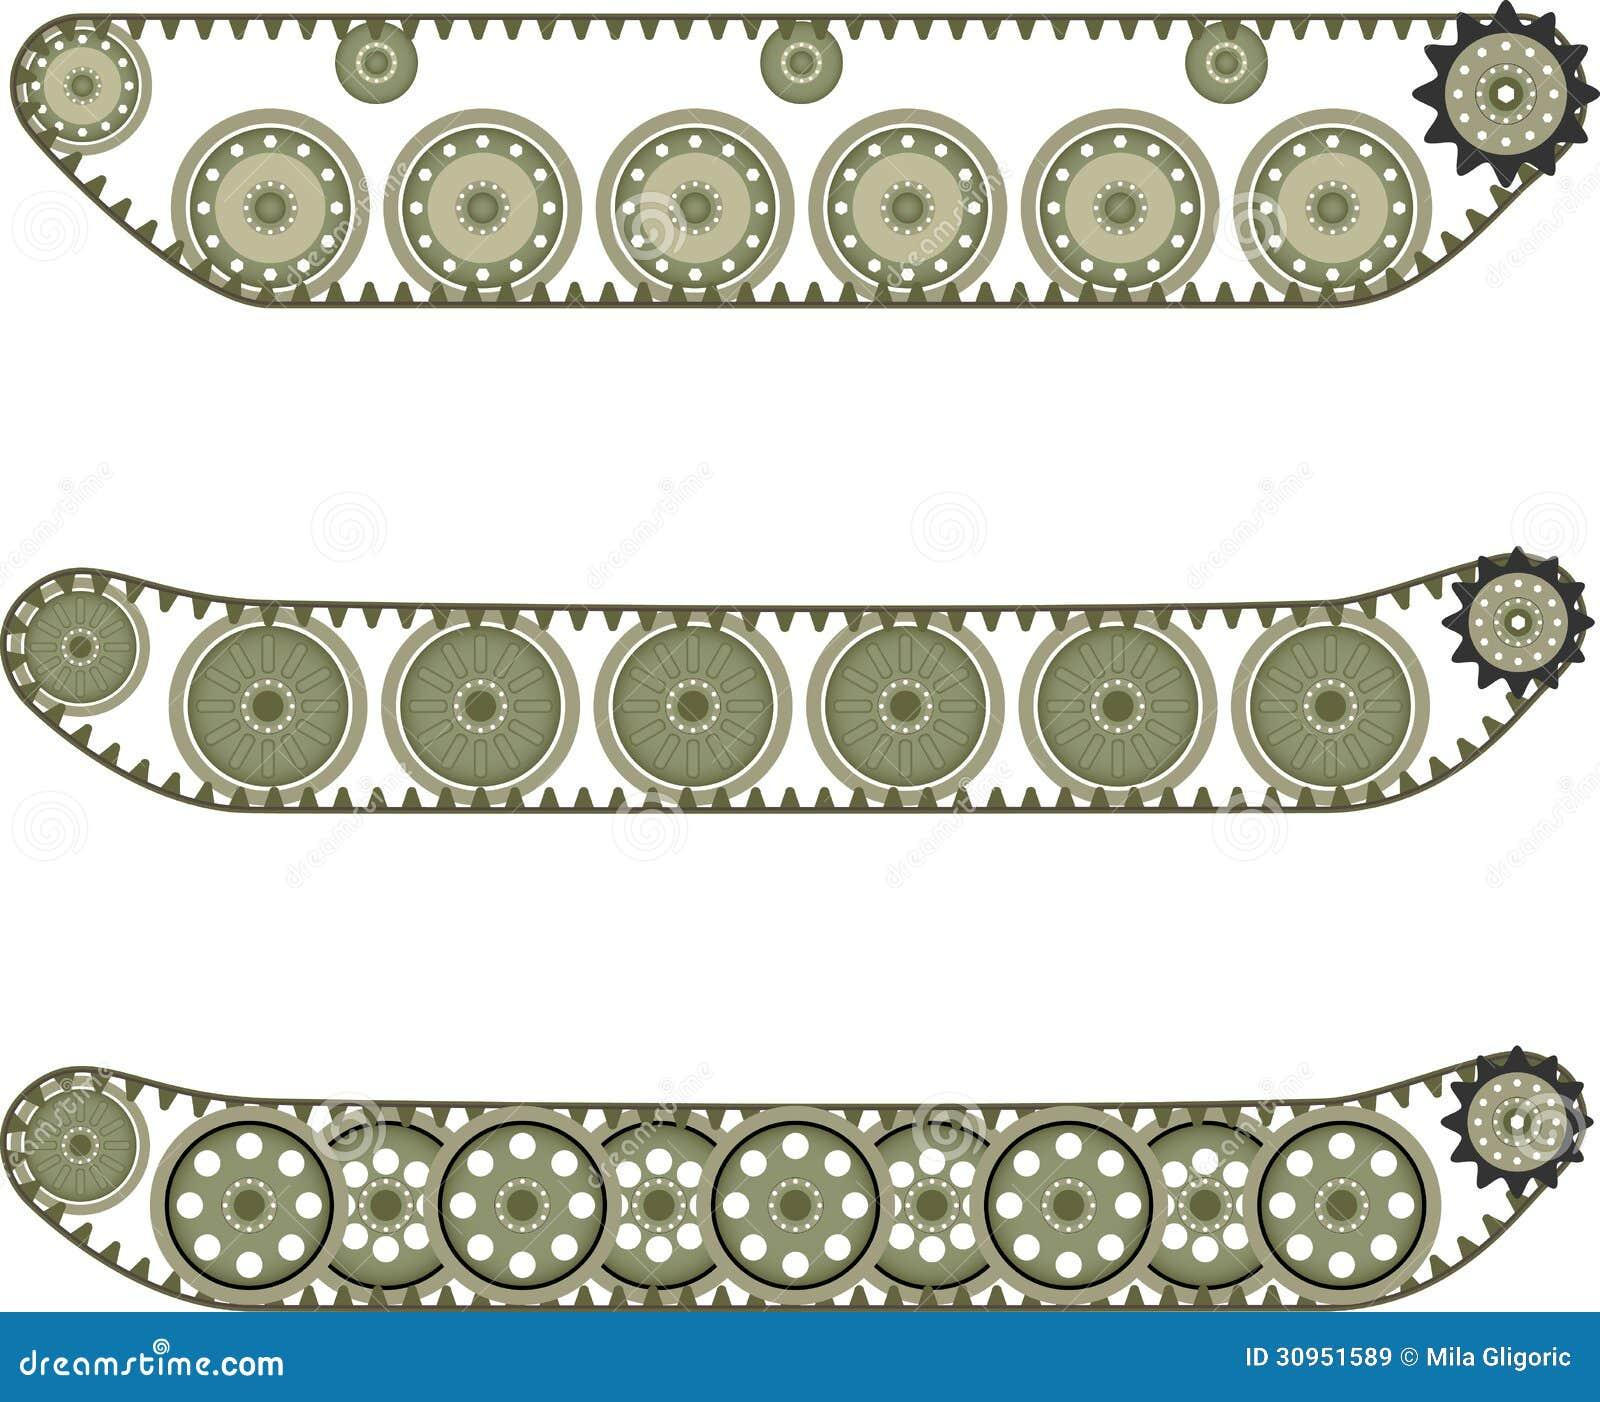 Tank Caterpillar Royalty Free Stock Images - Image: 30951589